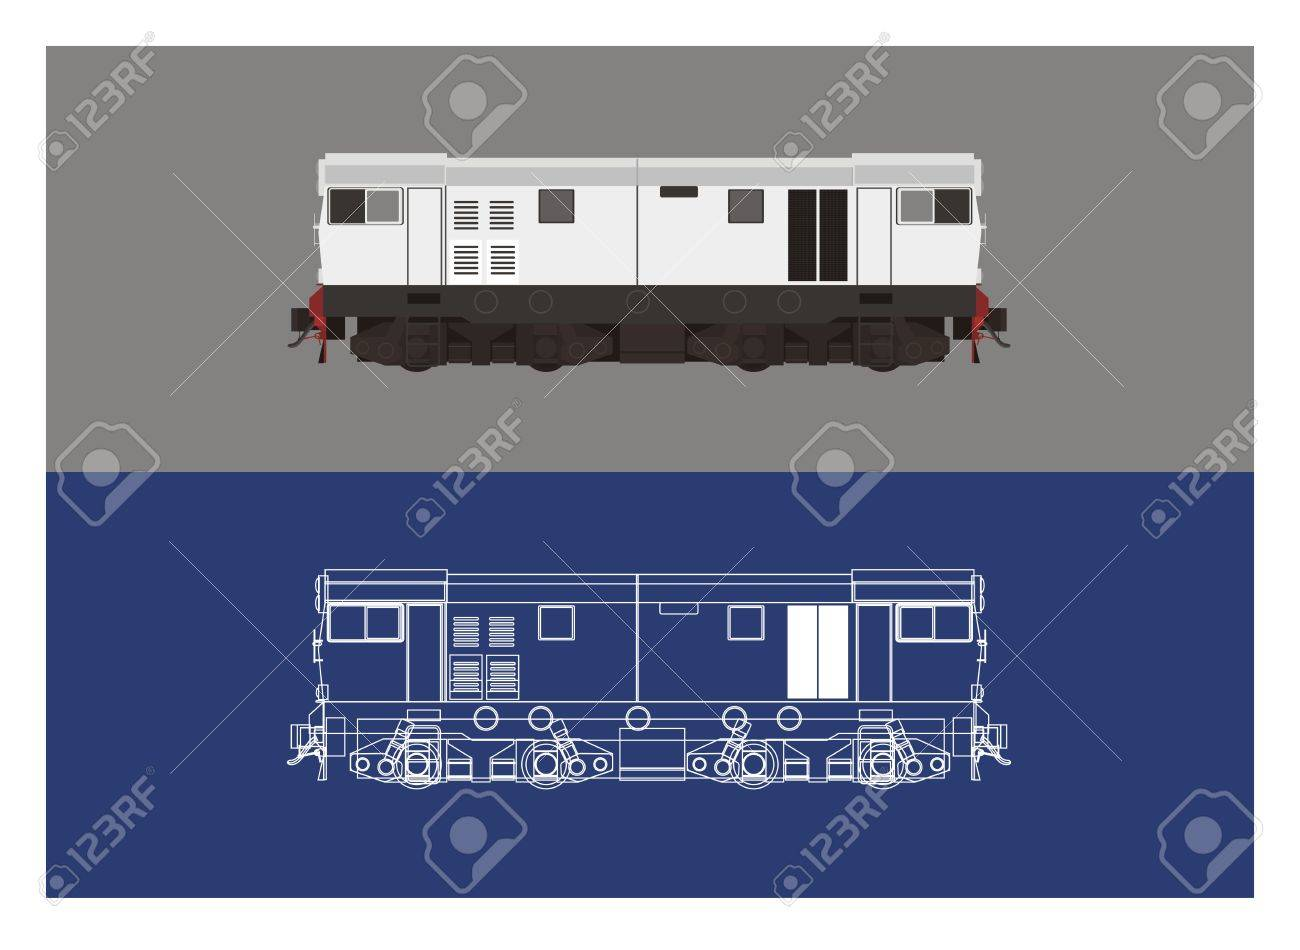 Locomotive in technical drawing art royalty free cliparts vectors locomotive in technical drawing art stock vector 46804912 malvernweather Gallery